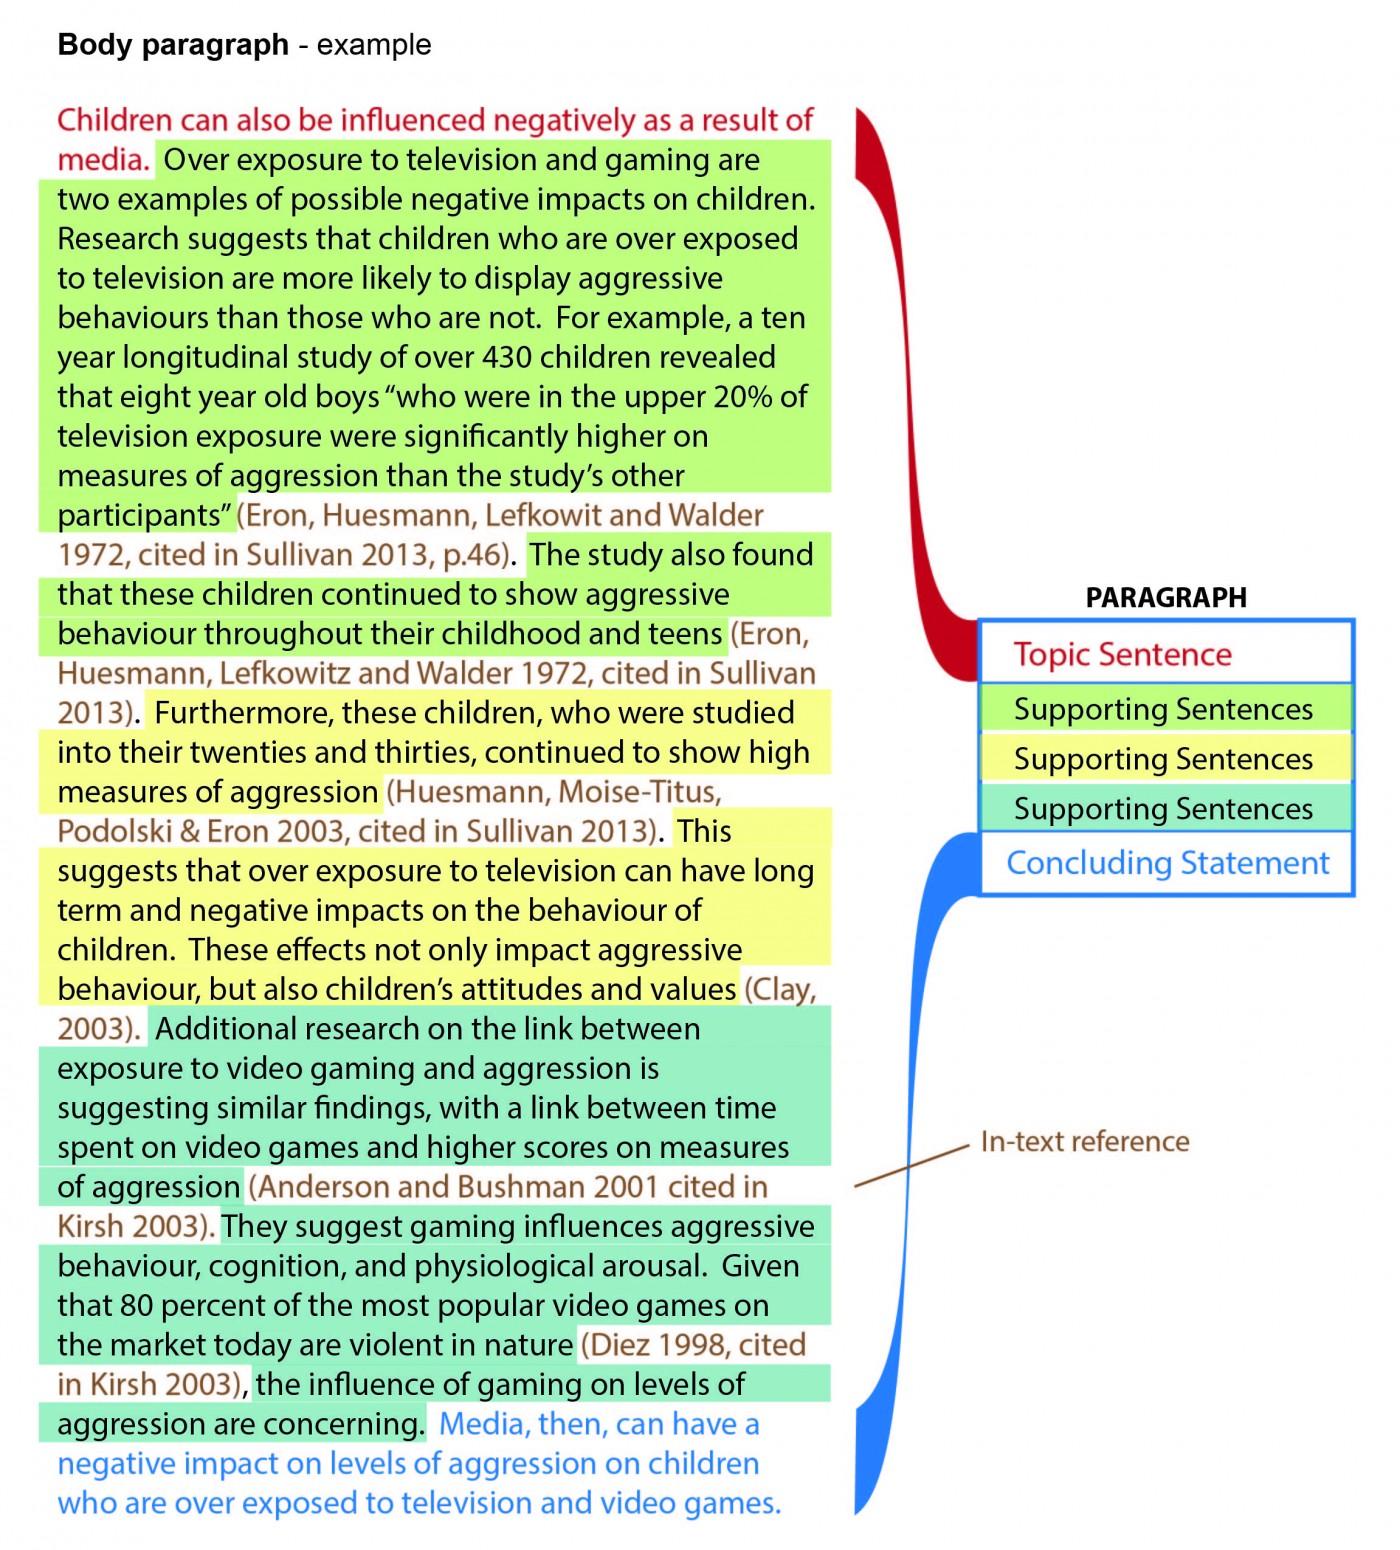 001 Essay Example Body Paragraph Fantastic Image Argumentative Topics Introduction Points 1400